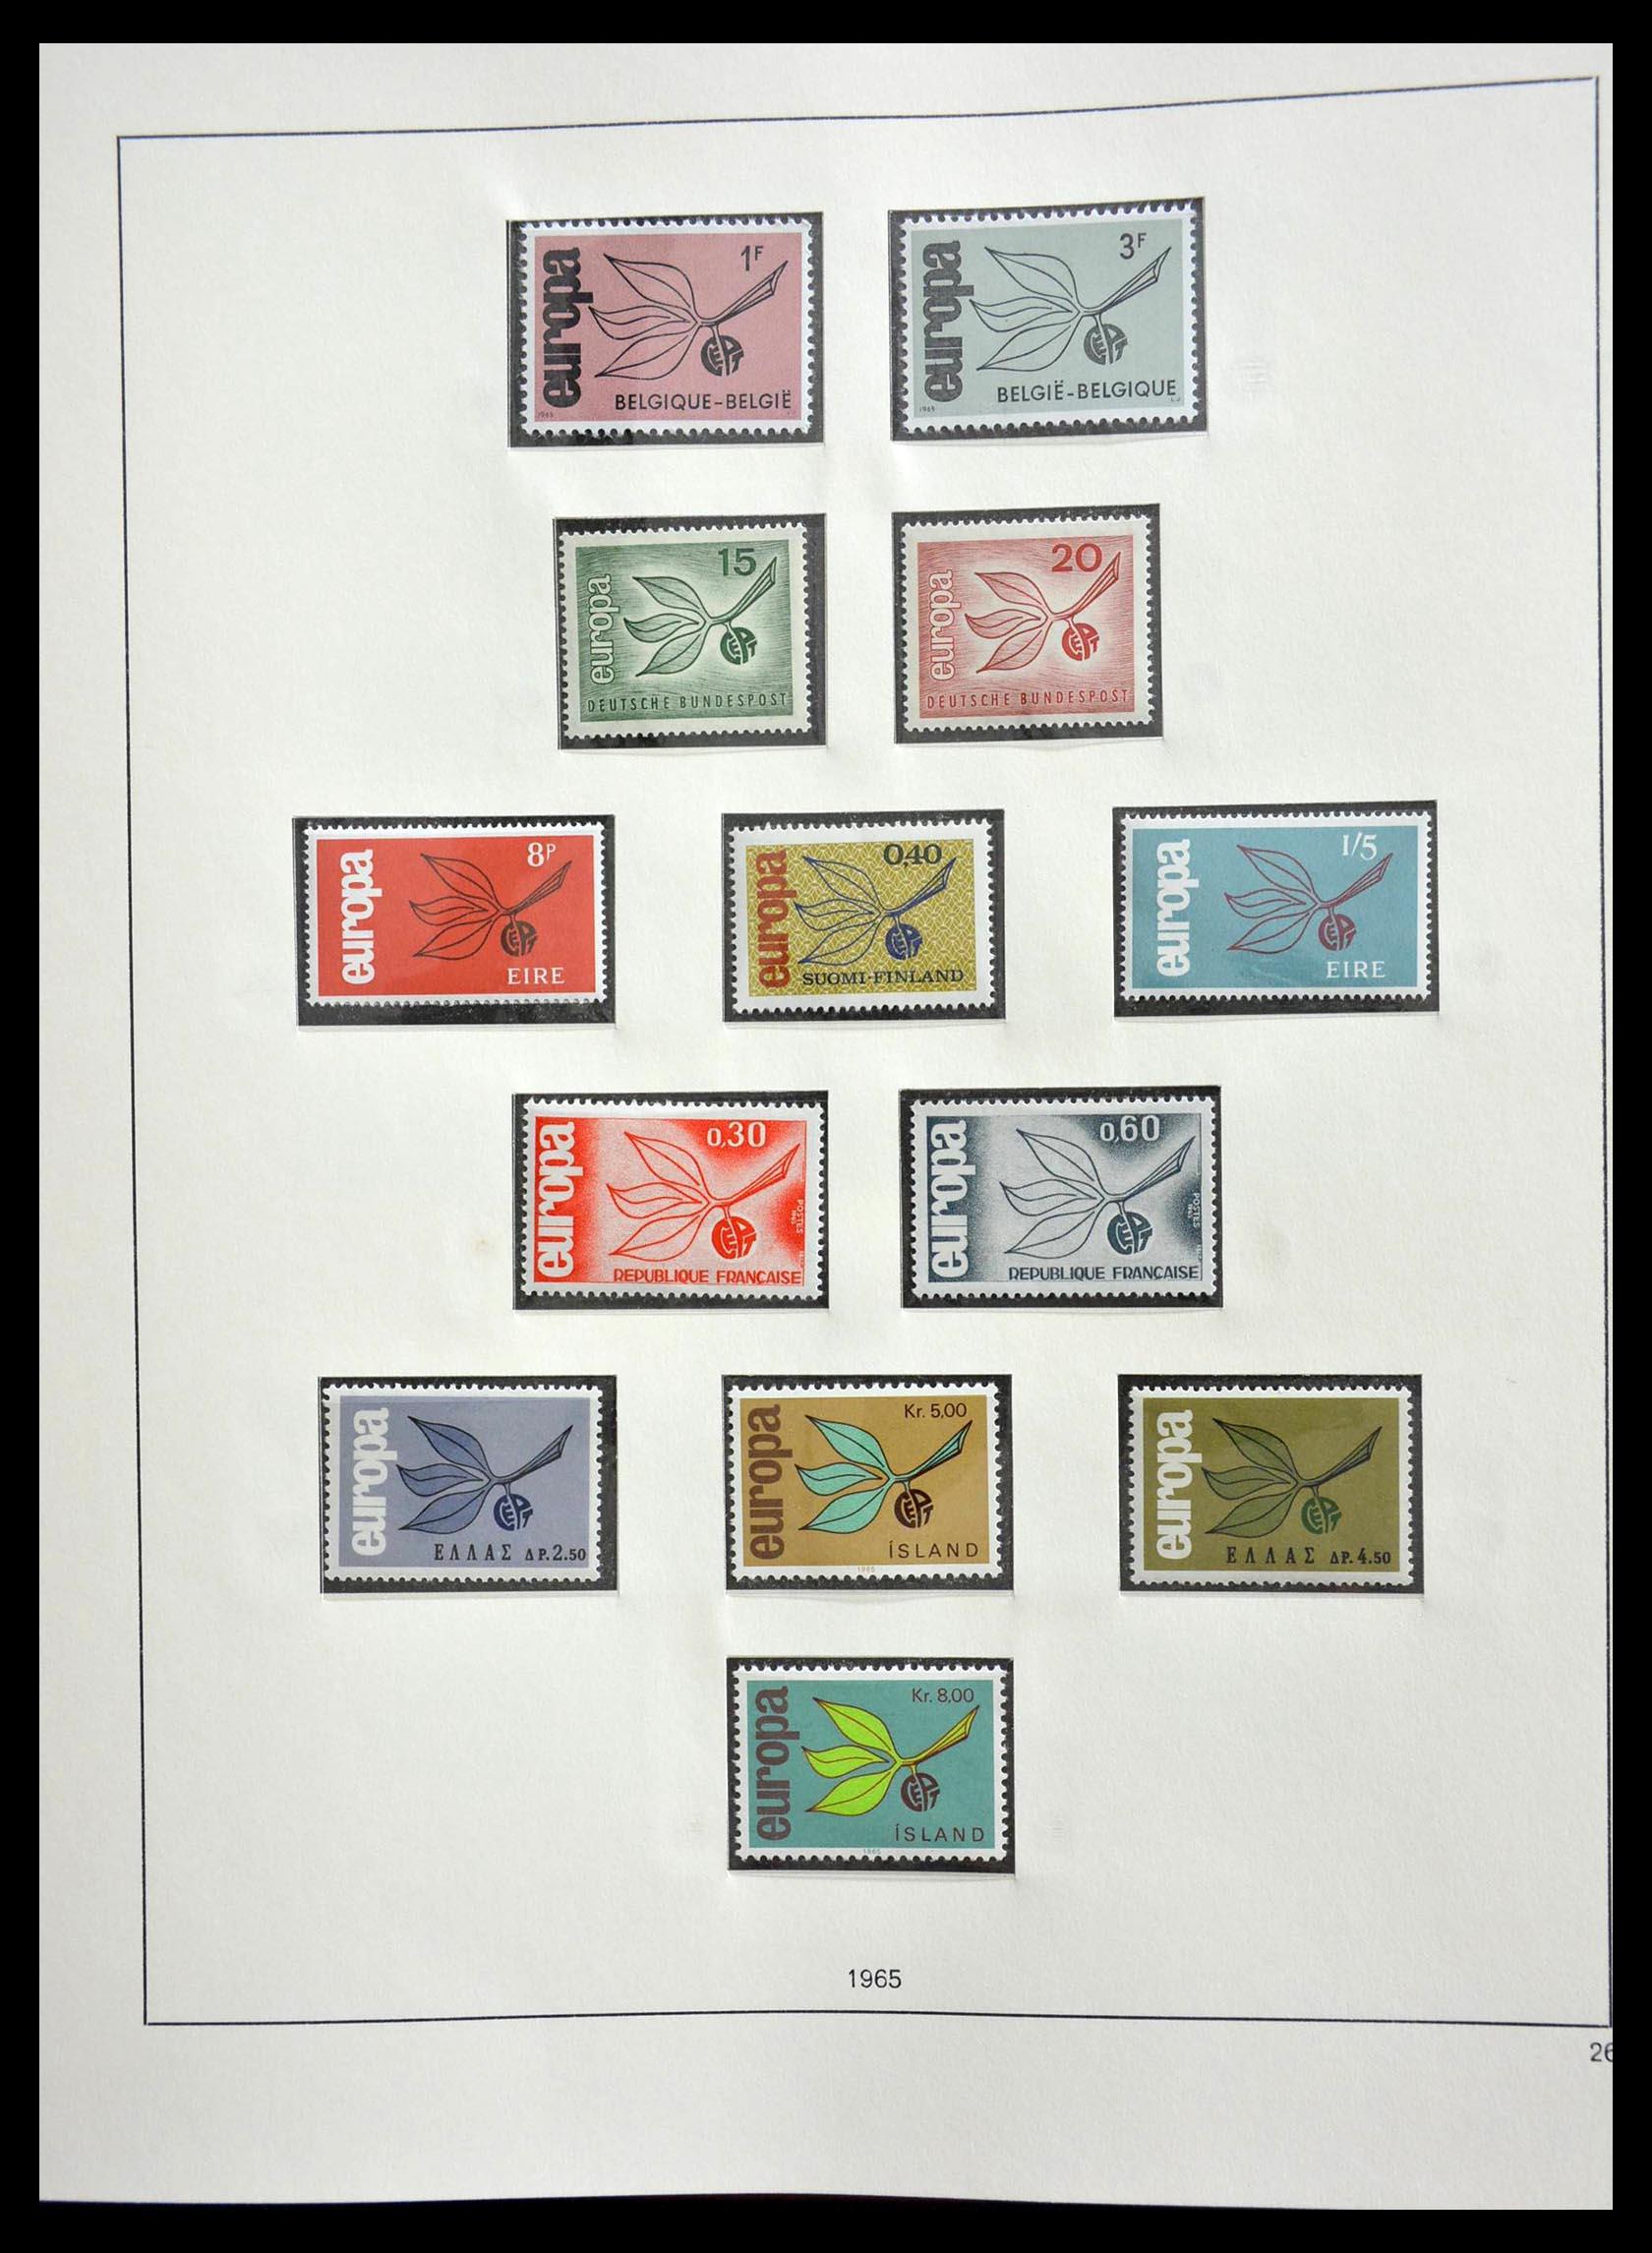 28637 019 - 28637 Europe Cept 1956-2000.